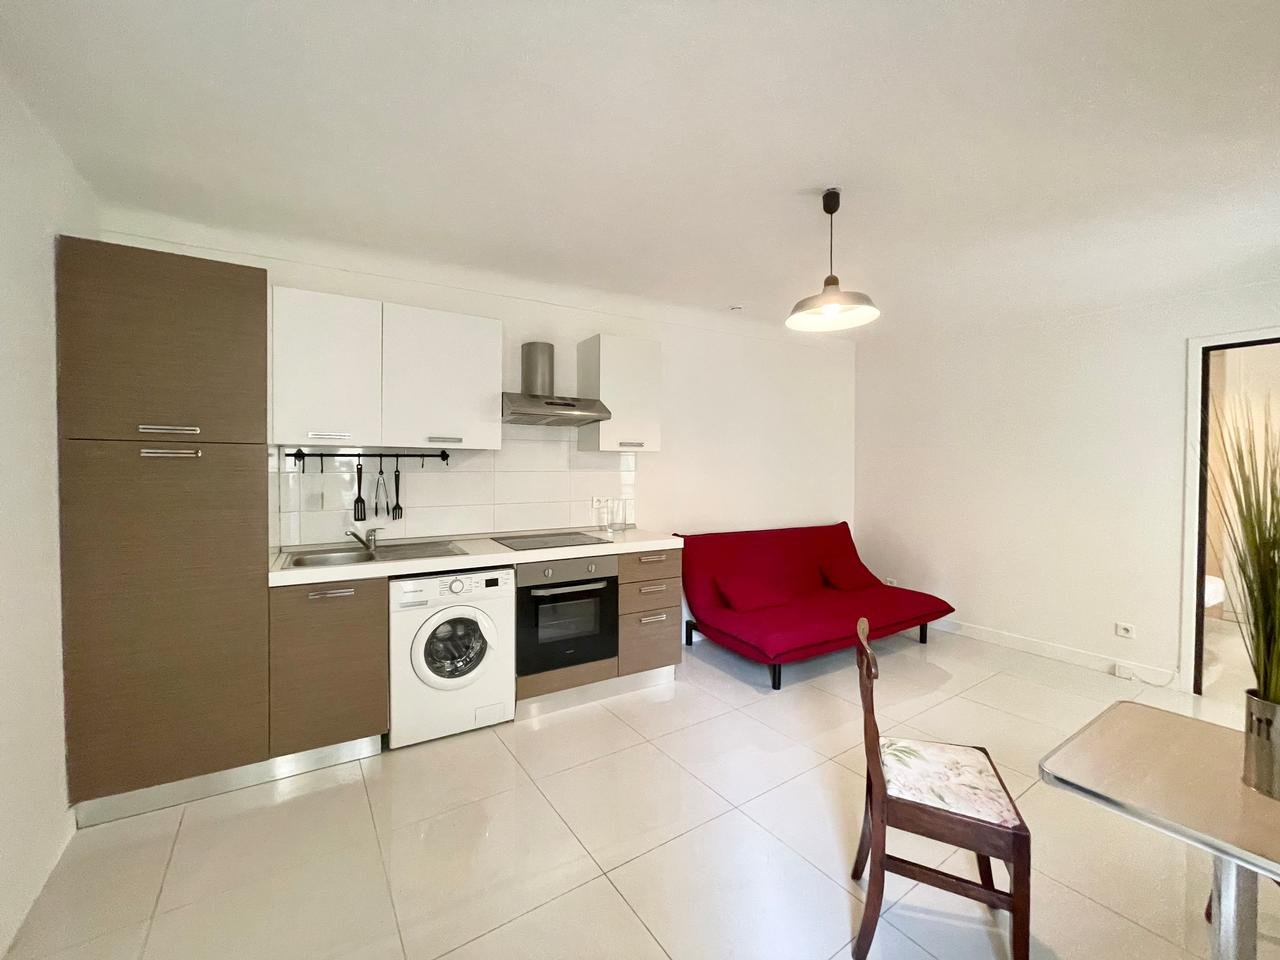 Apartment right by Rue de France & Promenade des Anglais